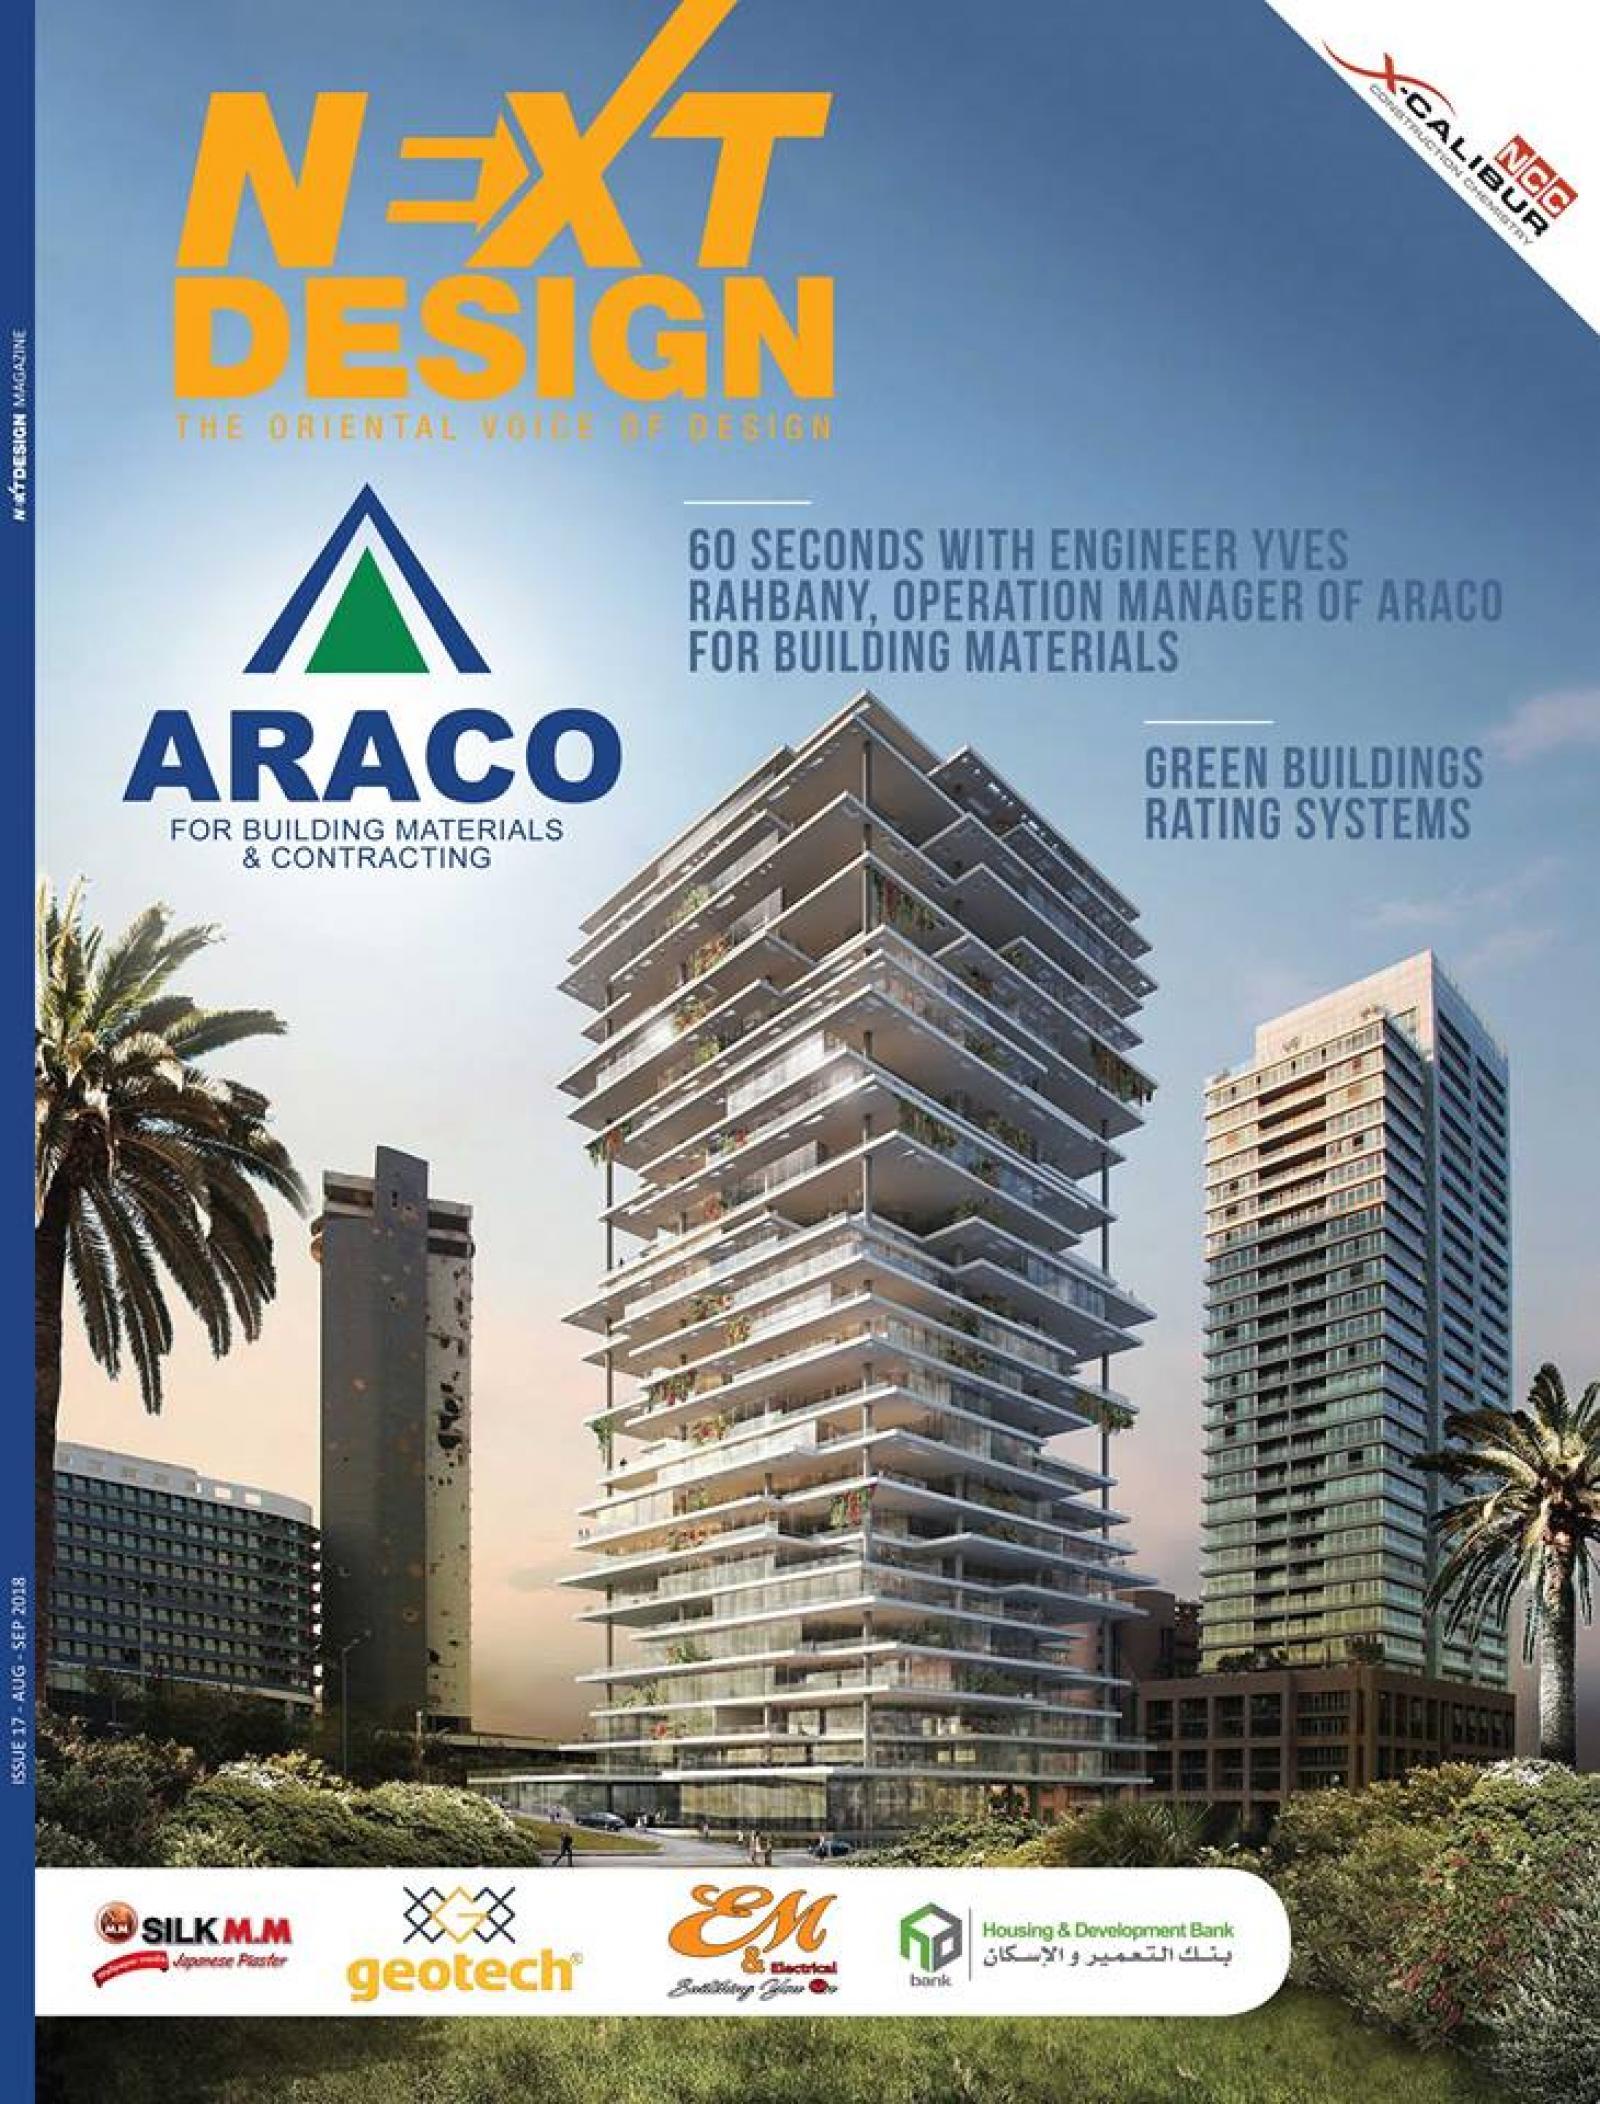 Wael Al-Masri Planners & Architects - WMPA   Interior Design